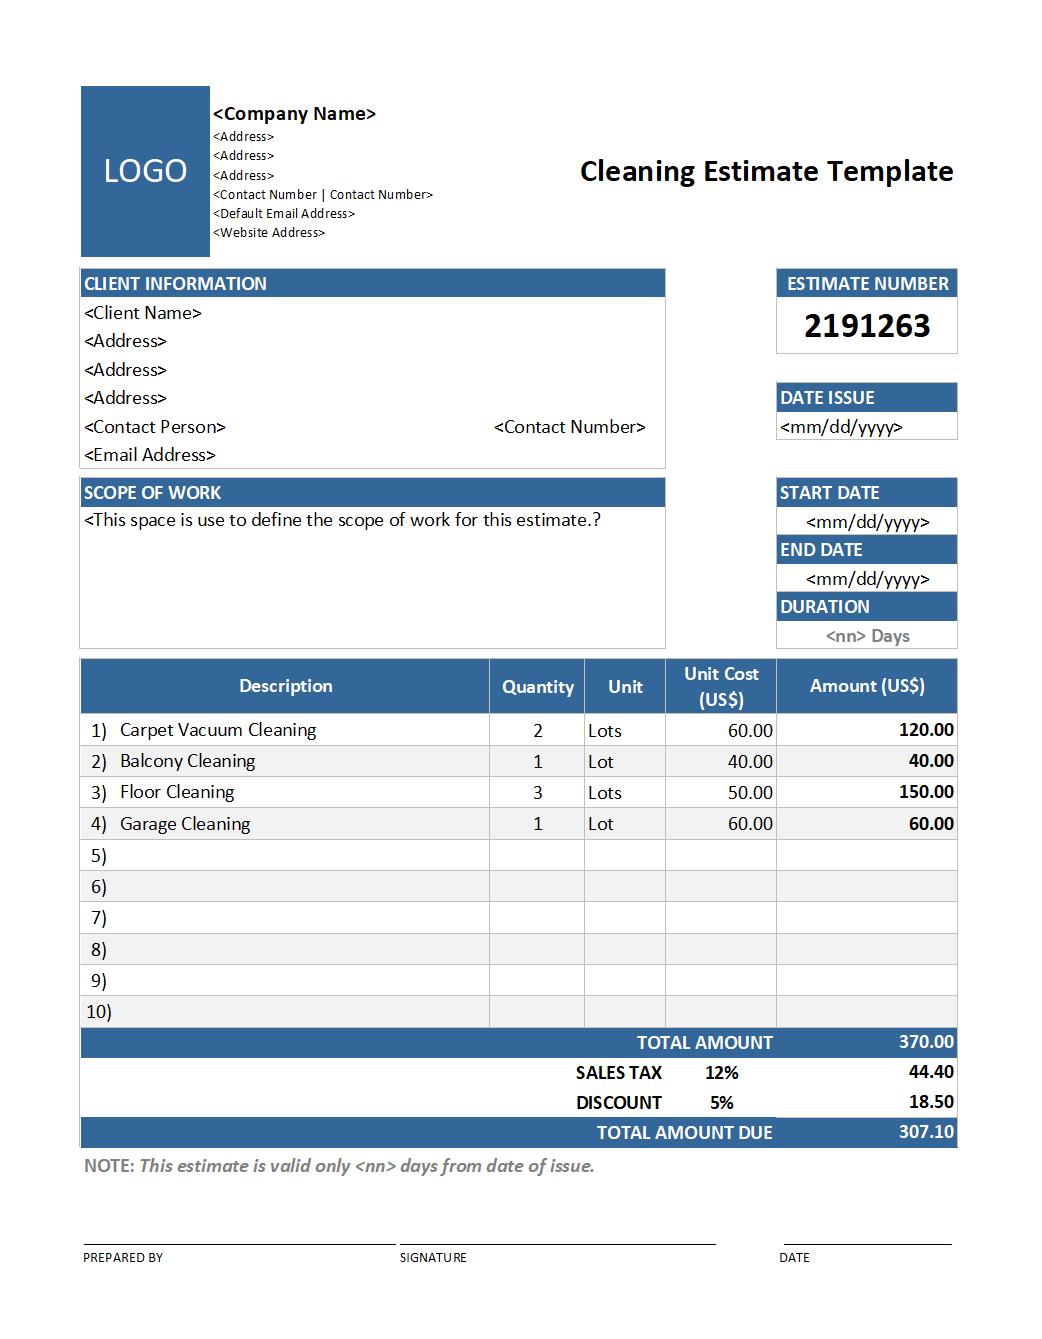 Download Cleaning Estimate Template V2 Estimate Template Templates Estimate